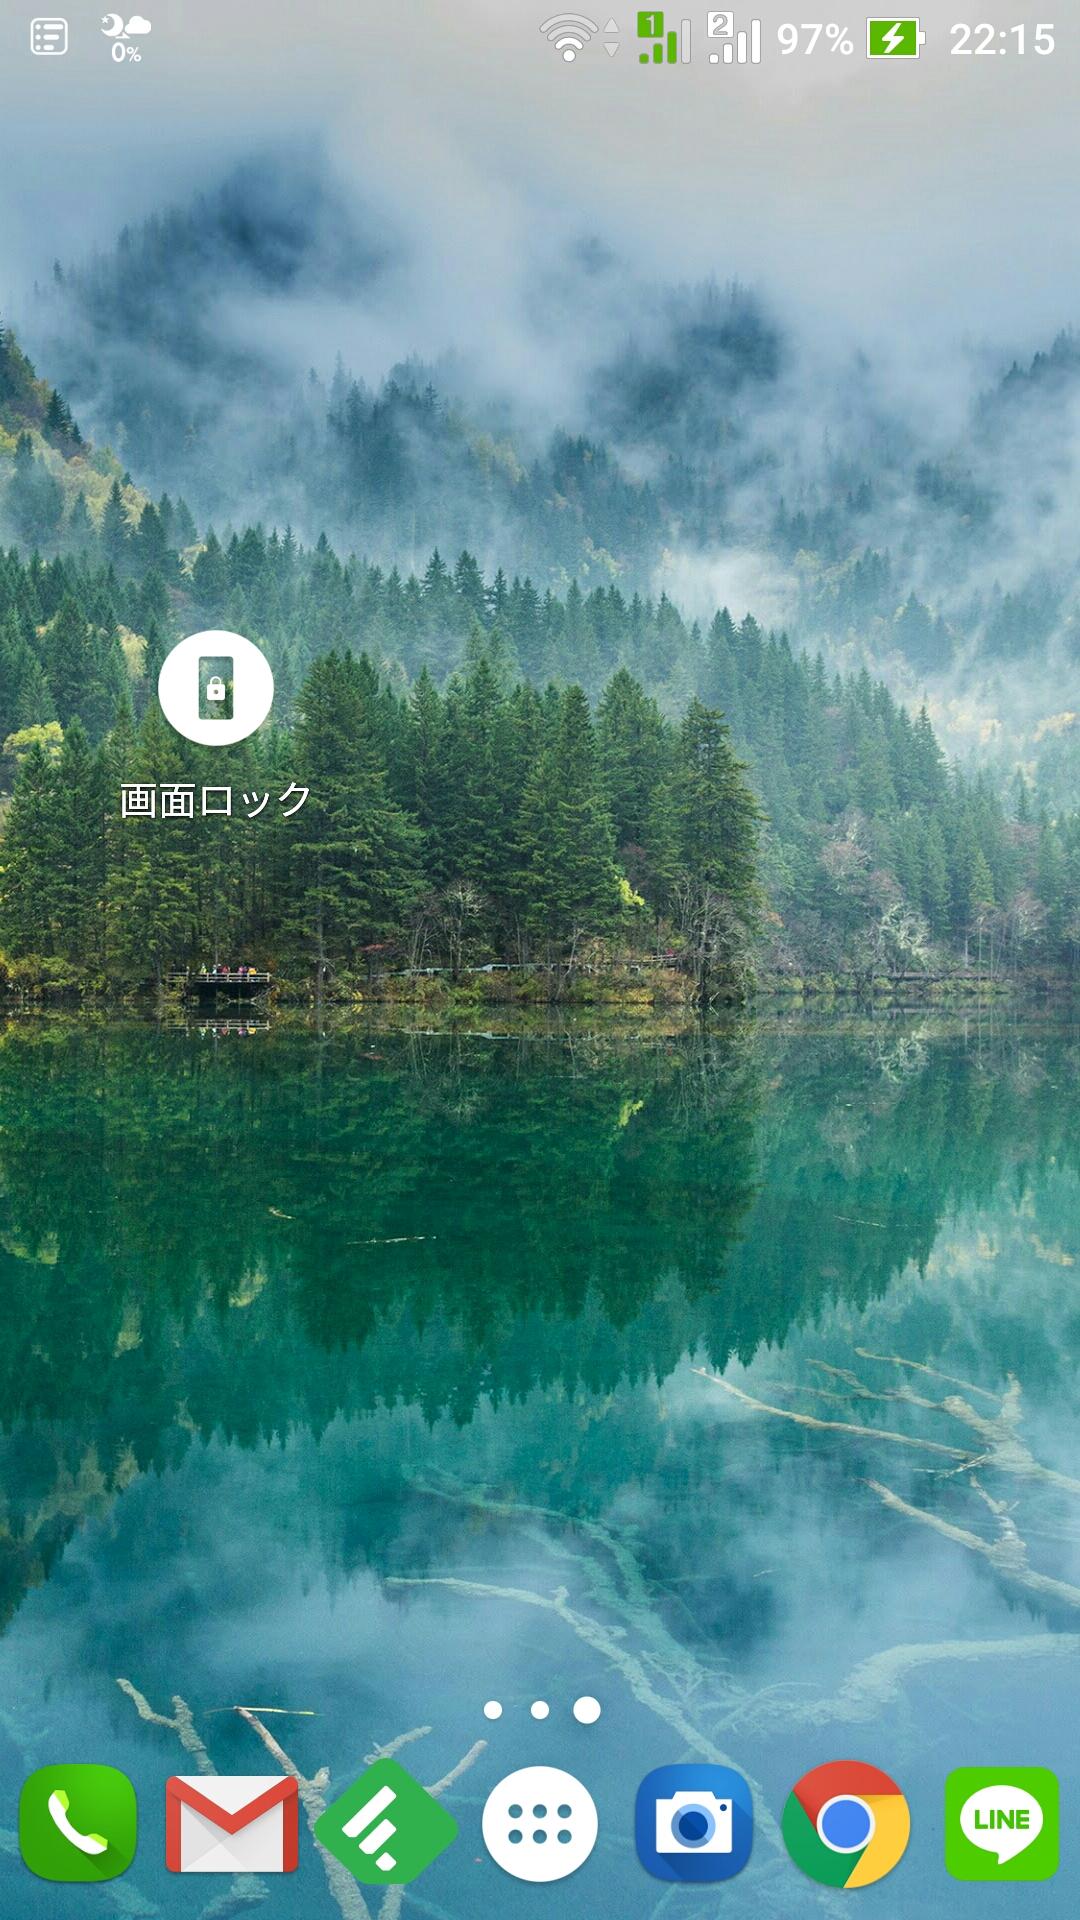 Zenfone3でZenUIランチャーからNova Launcherに変えるとスクリーンオフ機能が使えない!? その解決法。